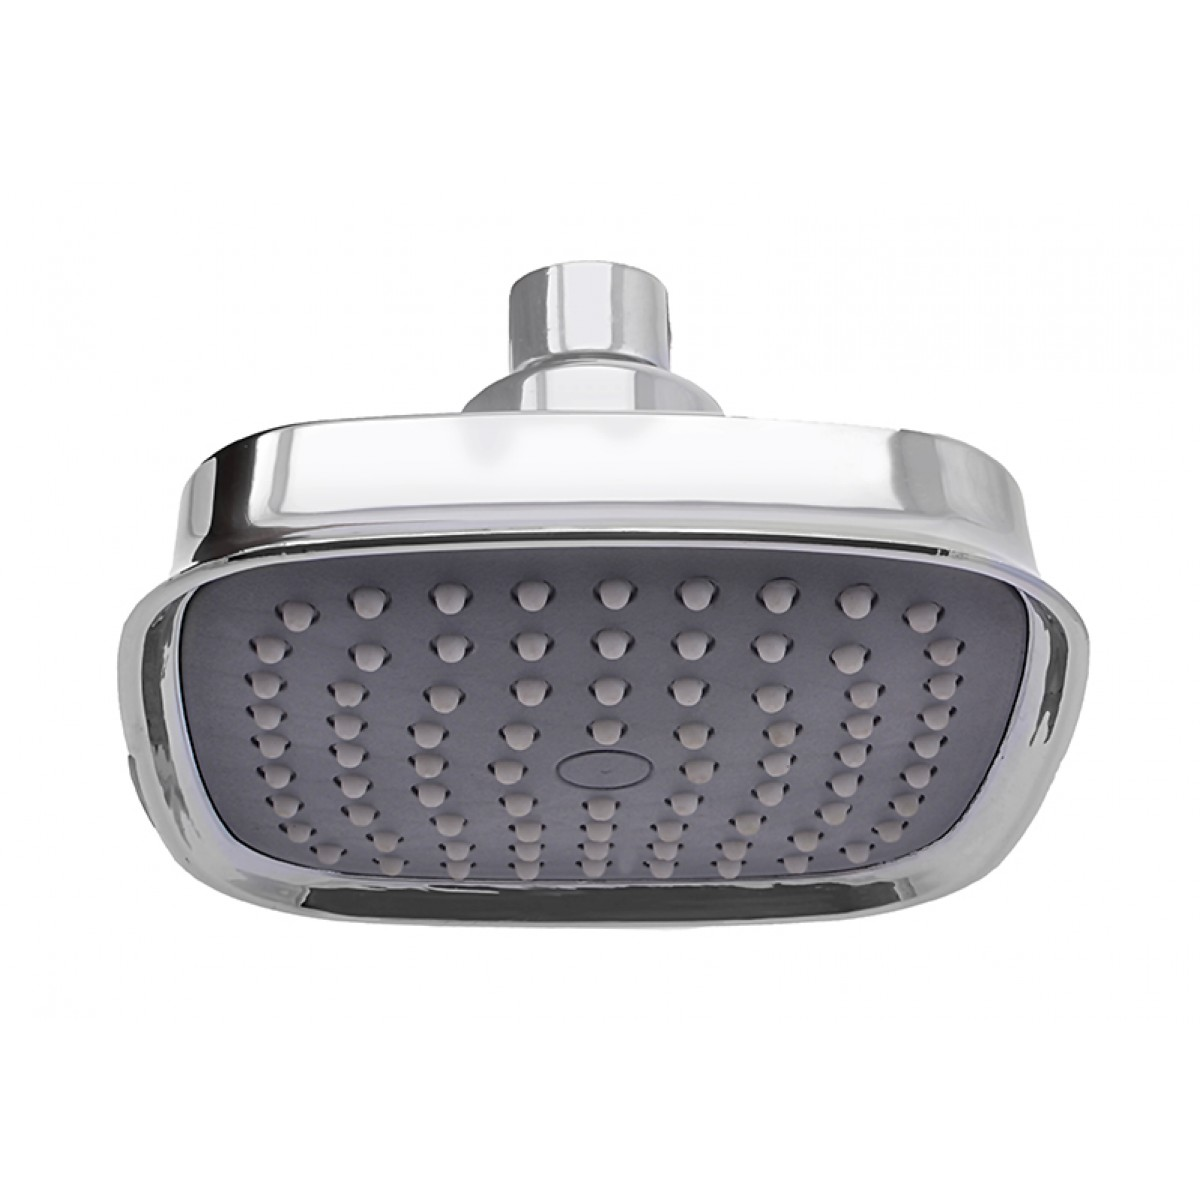 Buy Online Bathroom Shower Head - ABS Shower Head - 15x4x5 - Ruby ...